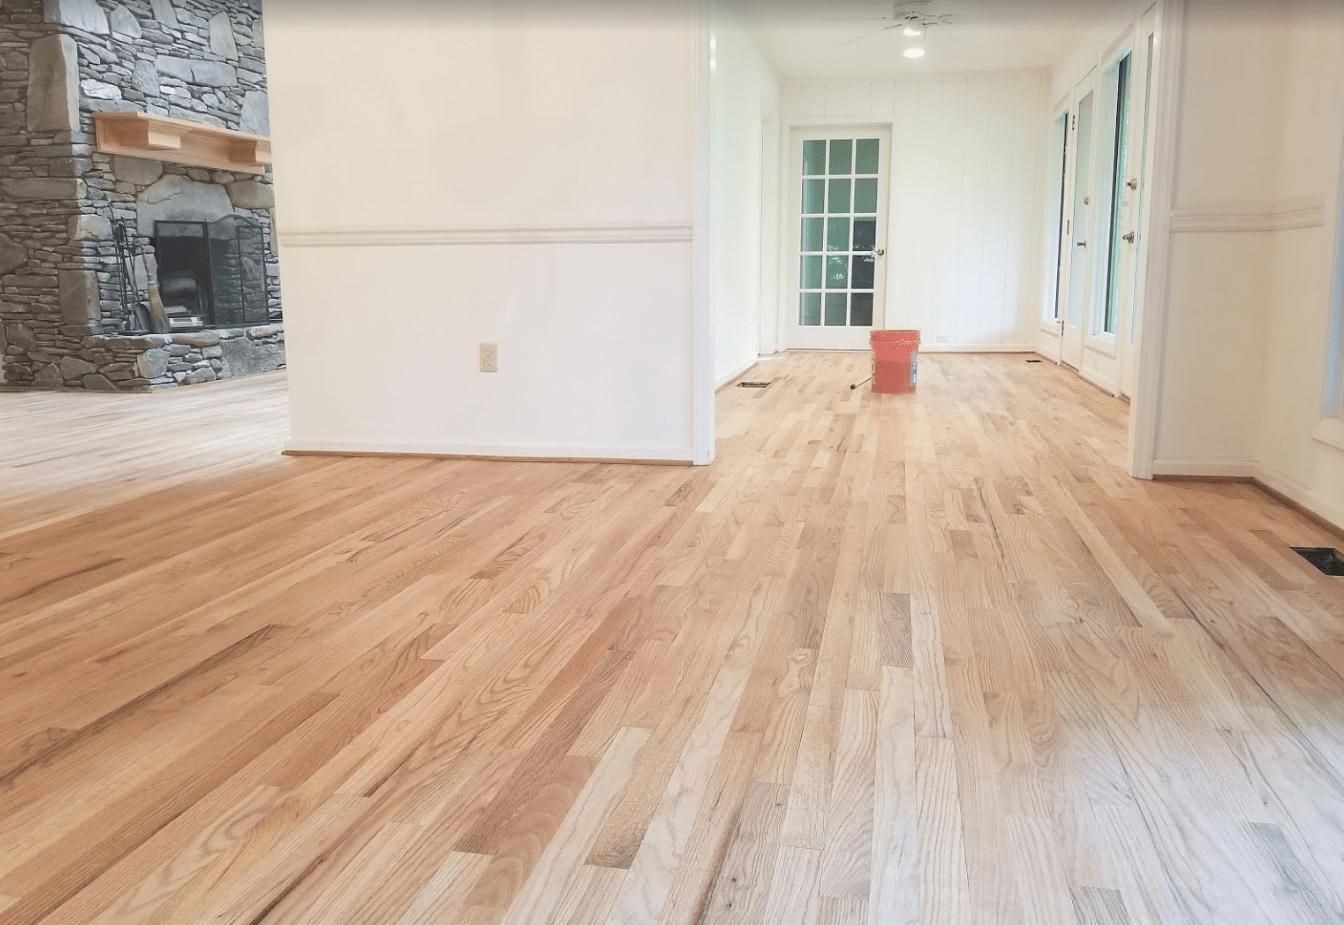 Flooring installation from Arbor Zen Hardwood Floors in Asheville, NC